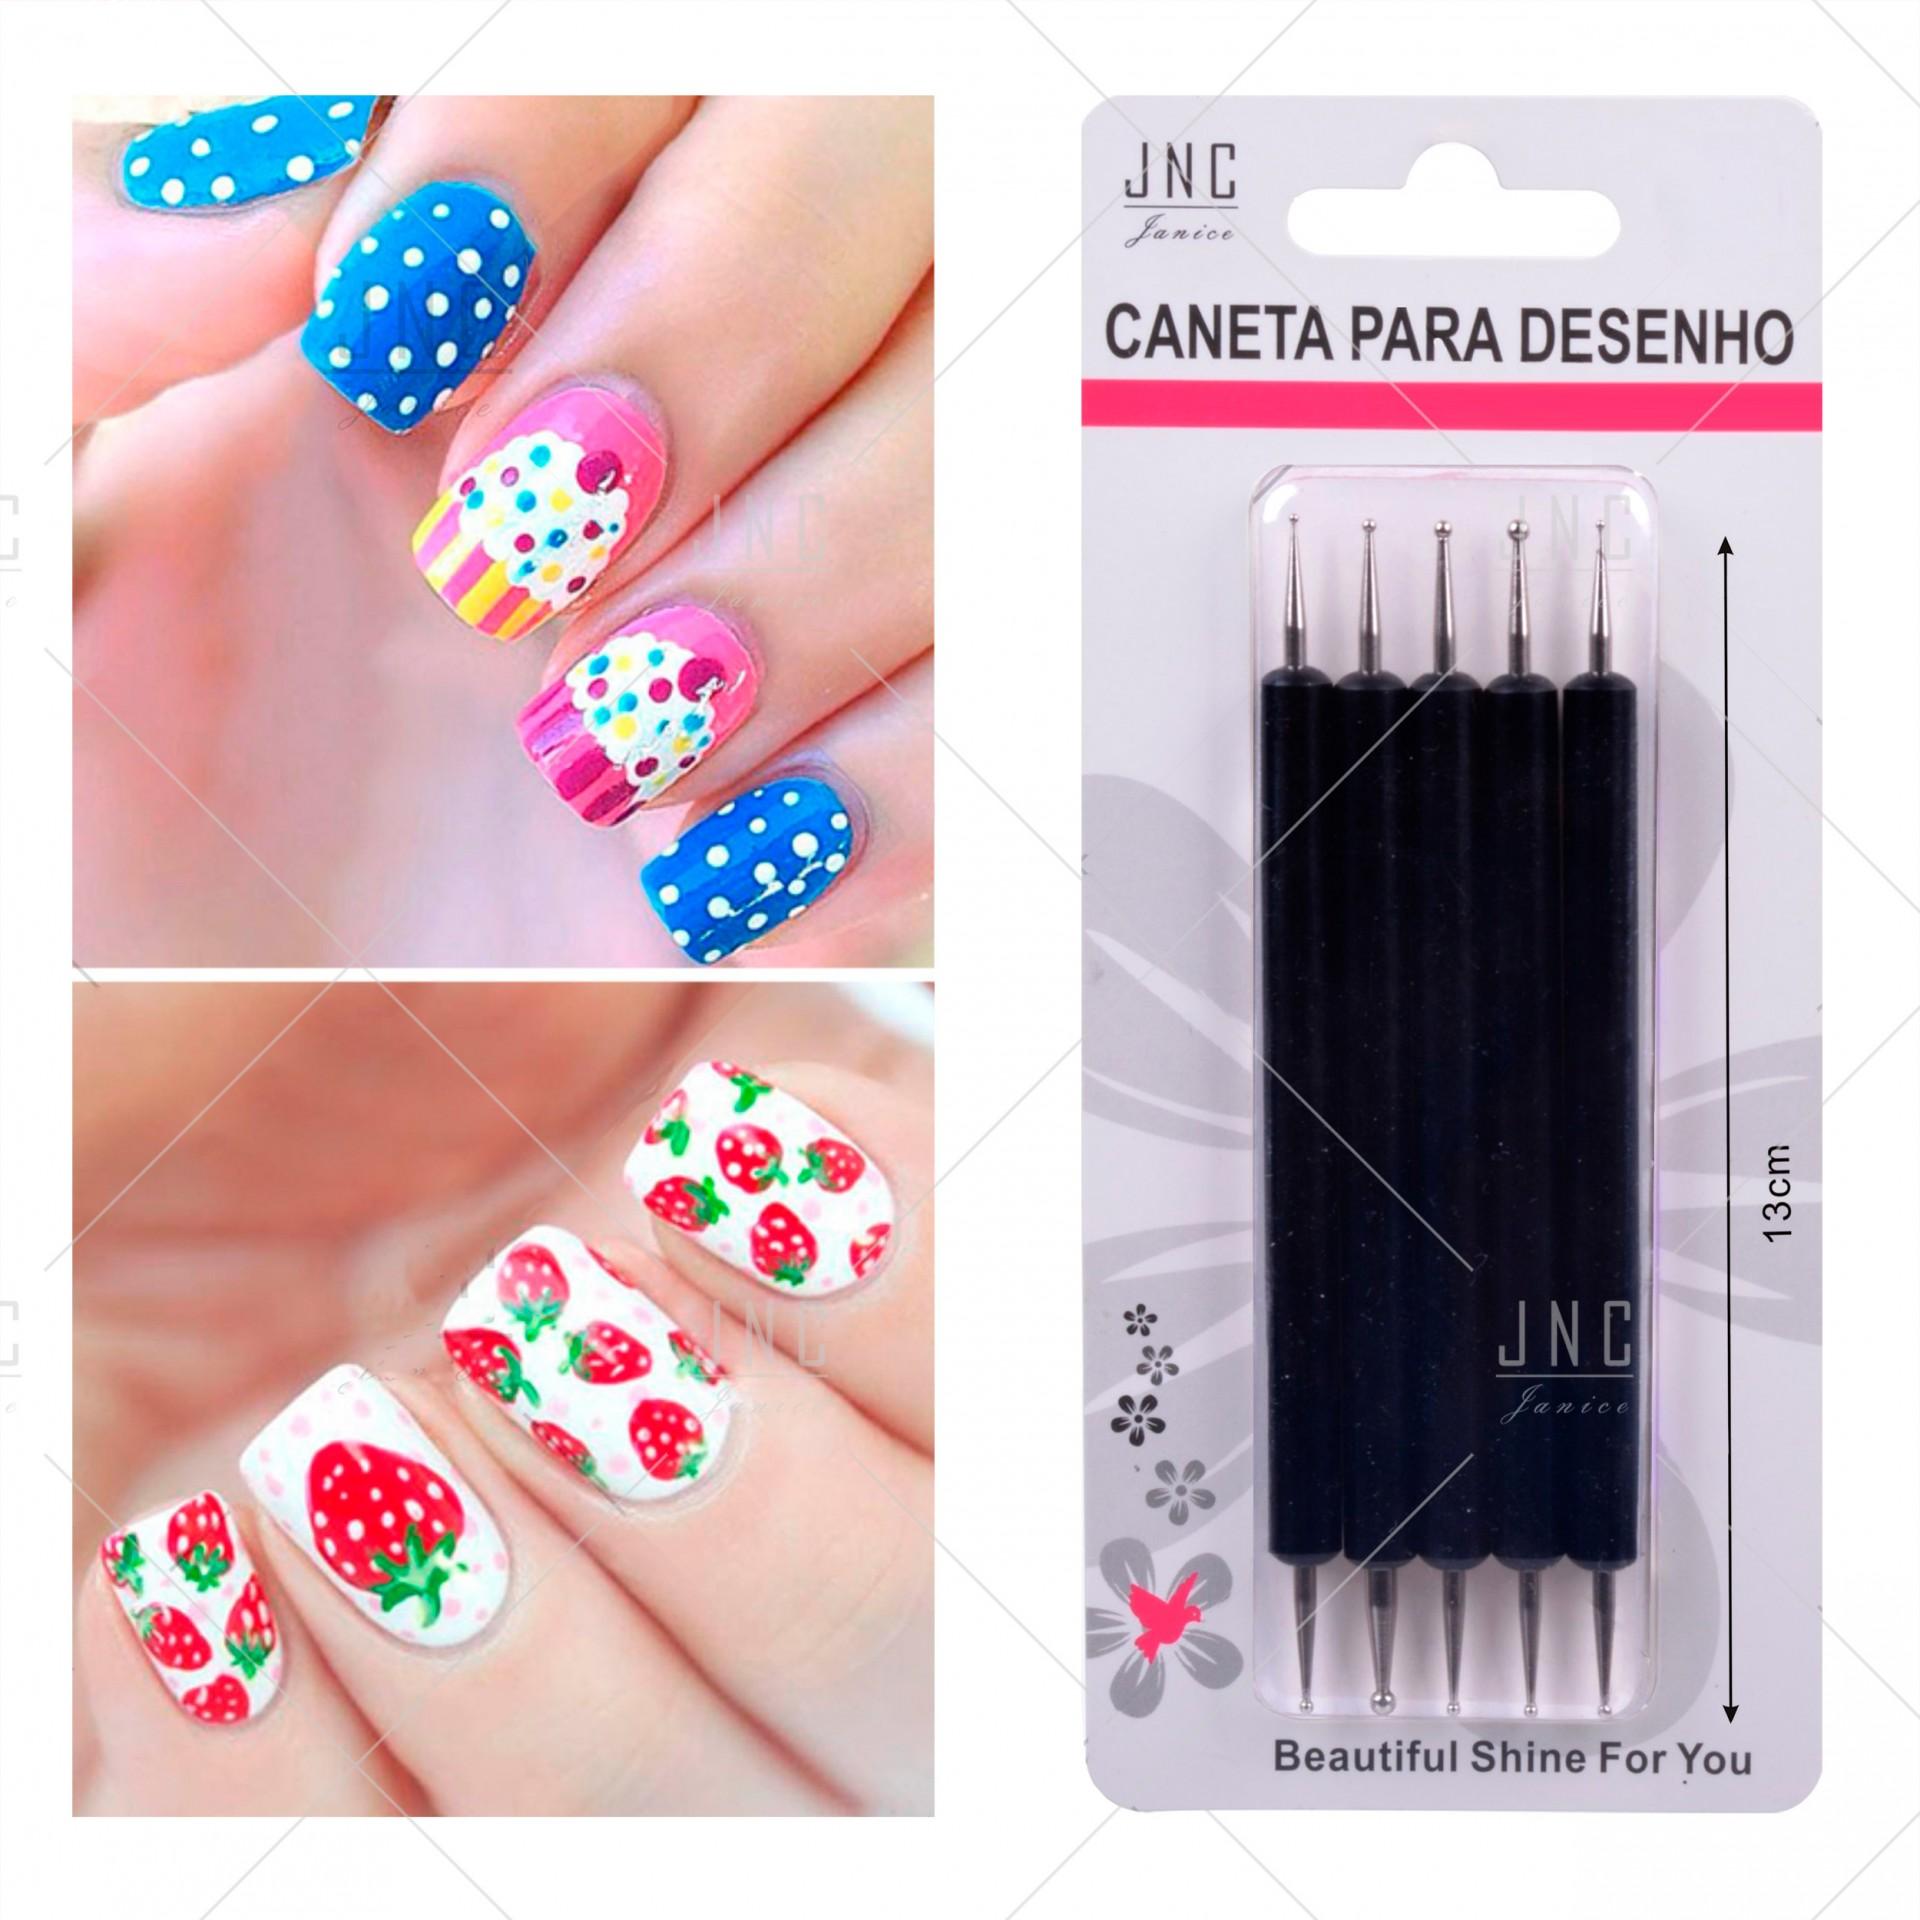 Kit com 5 Nails Pen | Ref.860459